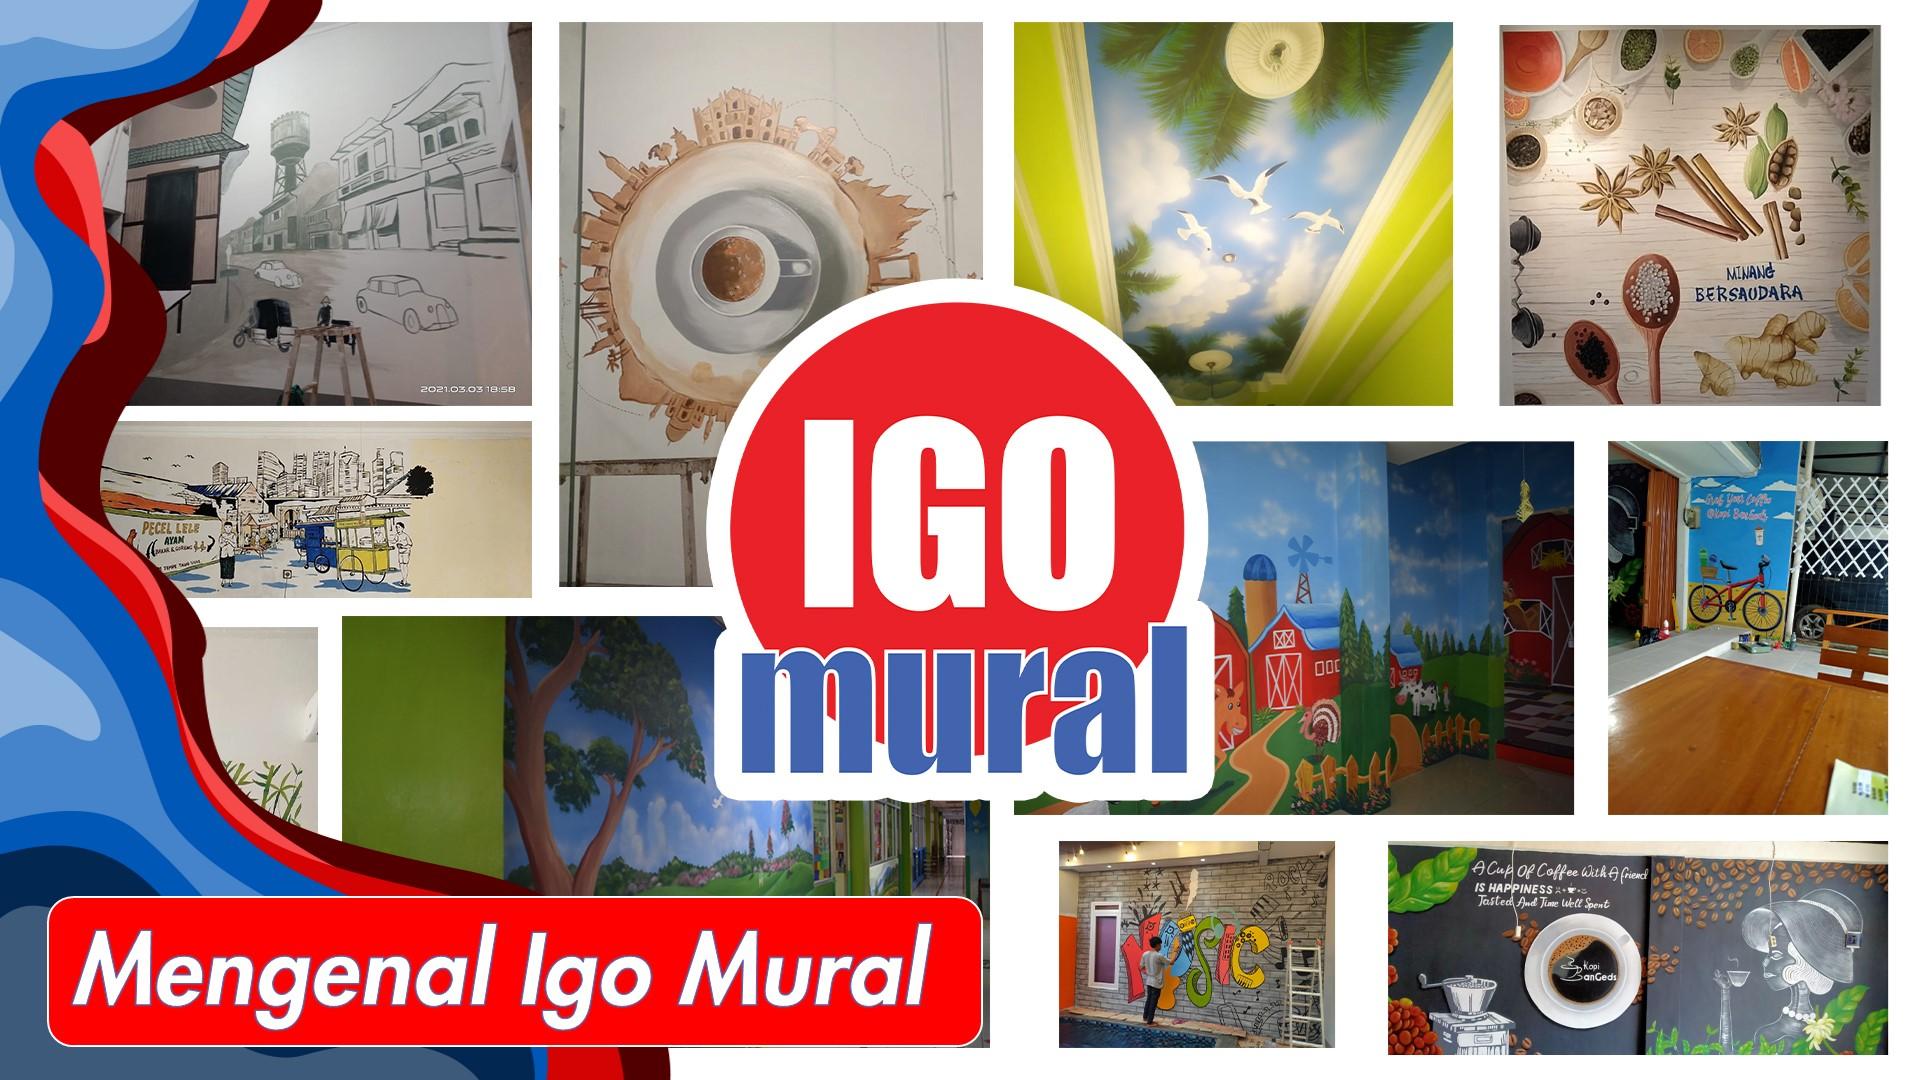 Mengenal Igo Mural